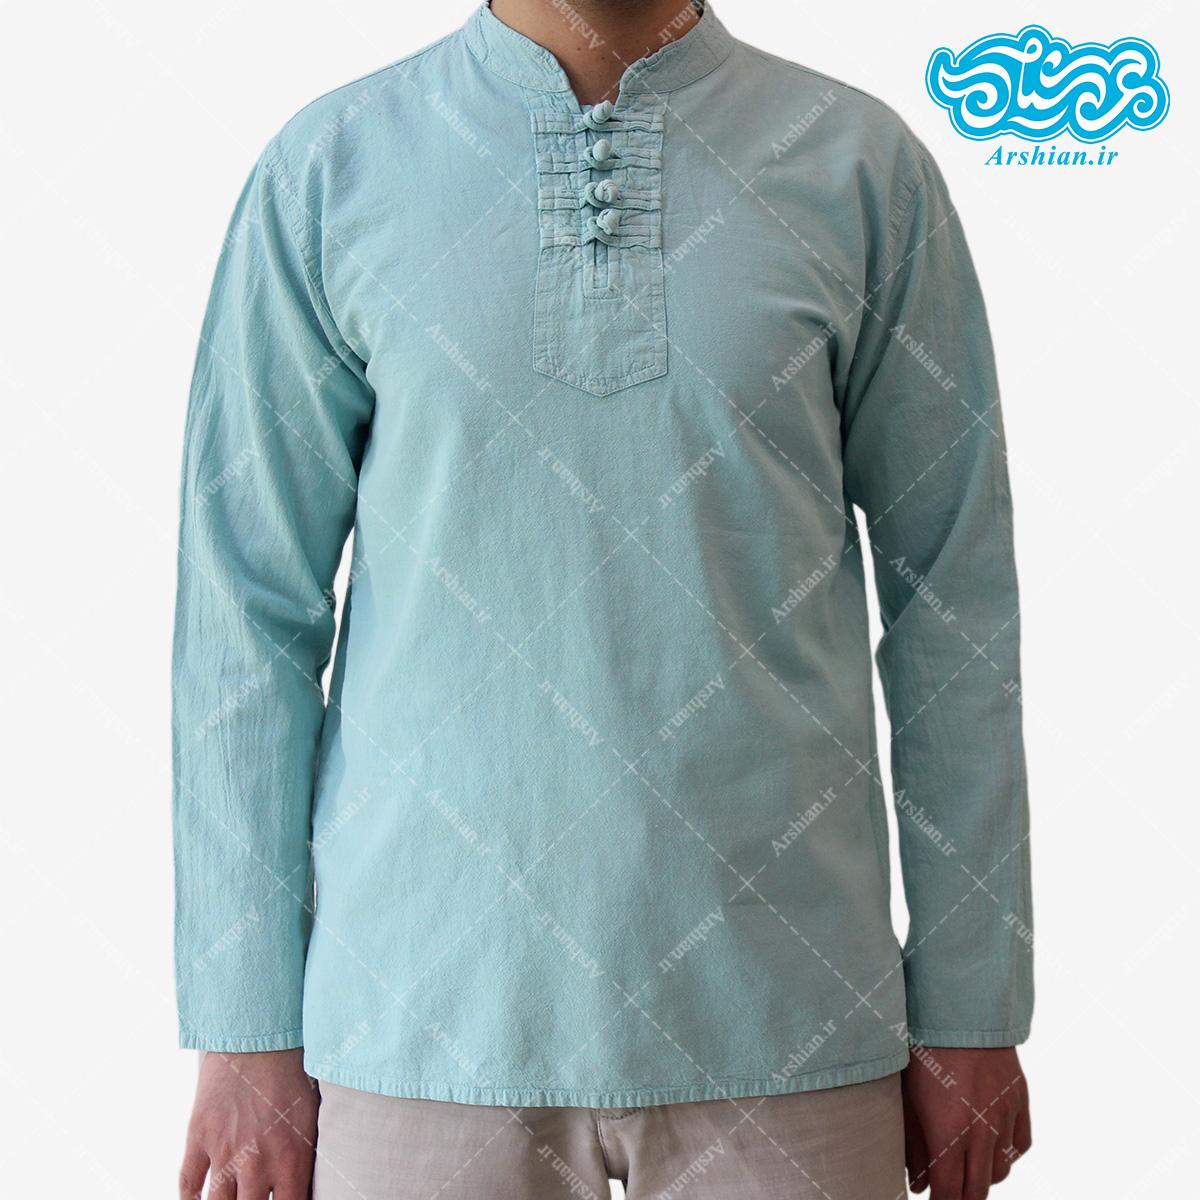 پیراهن الیاف طبیعی طرح گره ای مدل a001